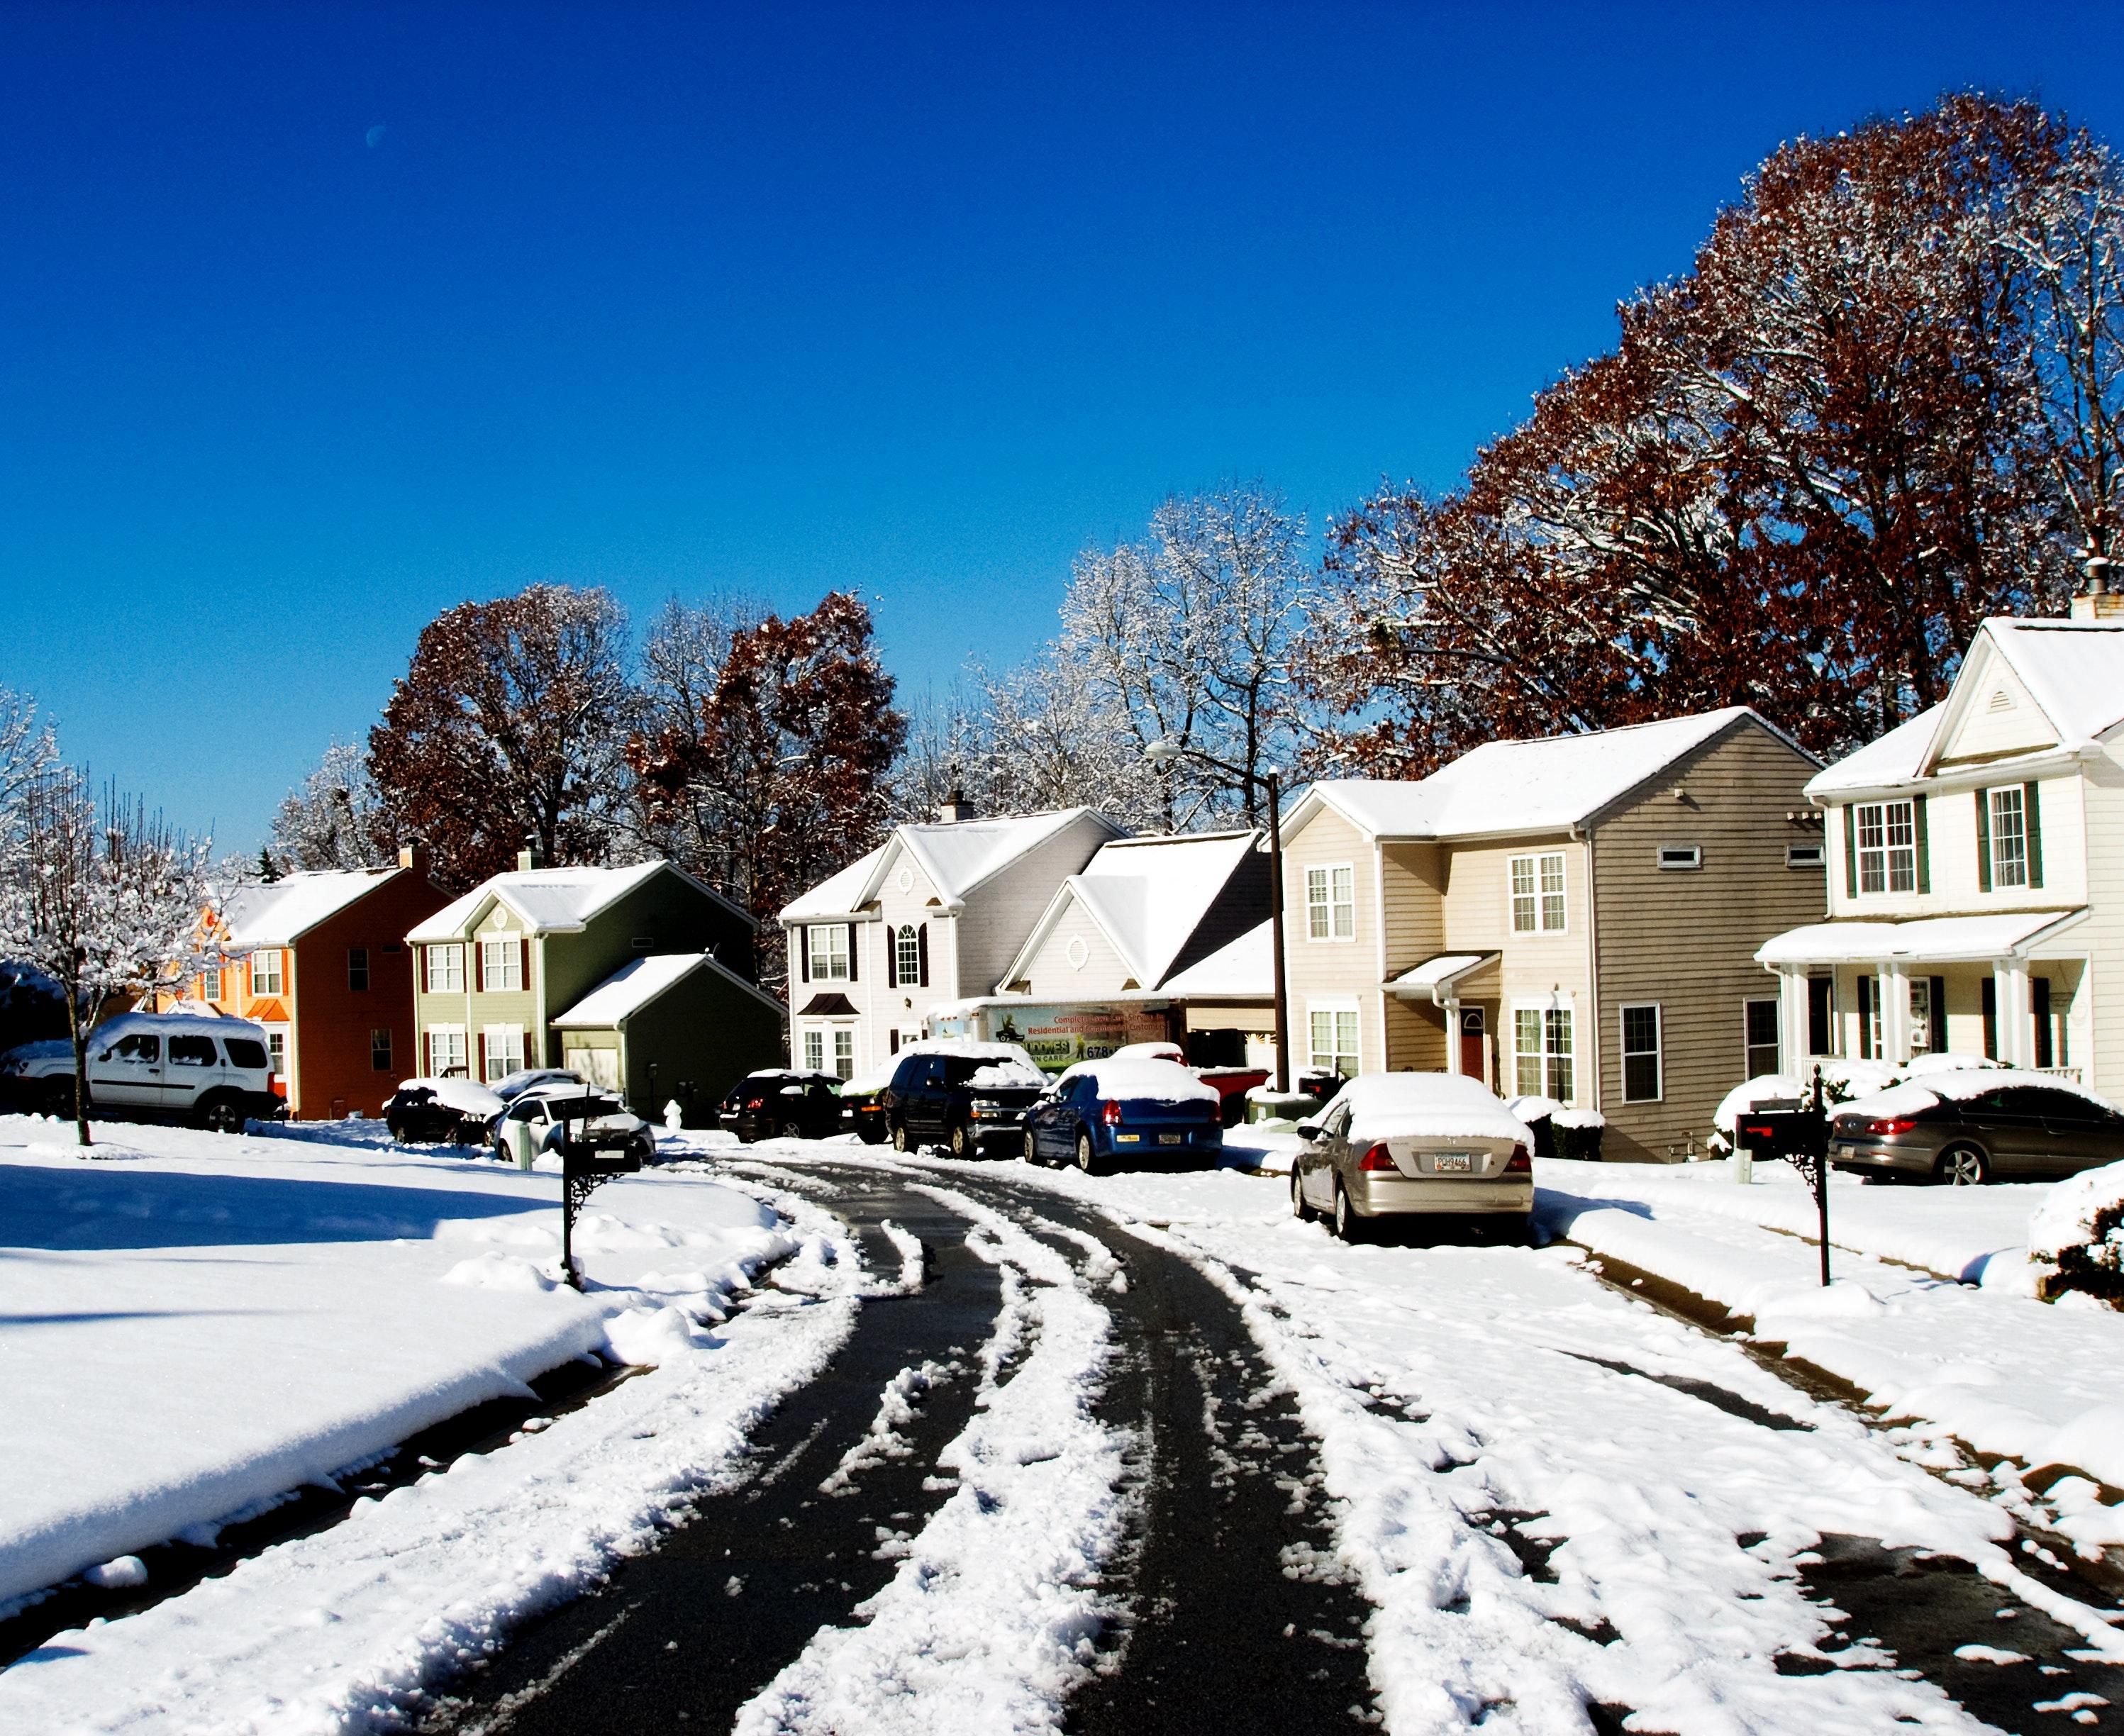 Bird S Eye View Of Snowy Town 183 Free Stock Photo